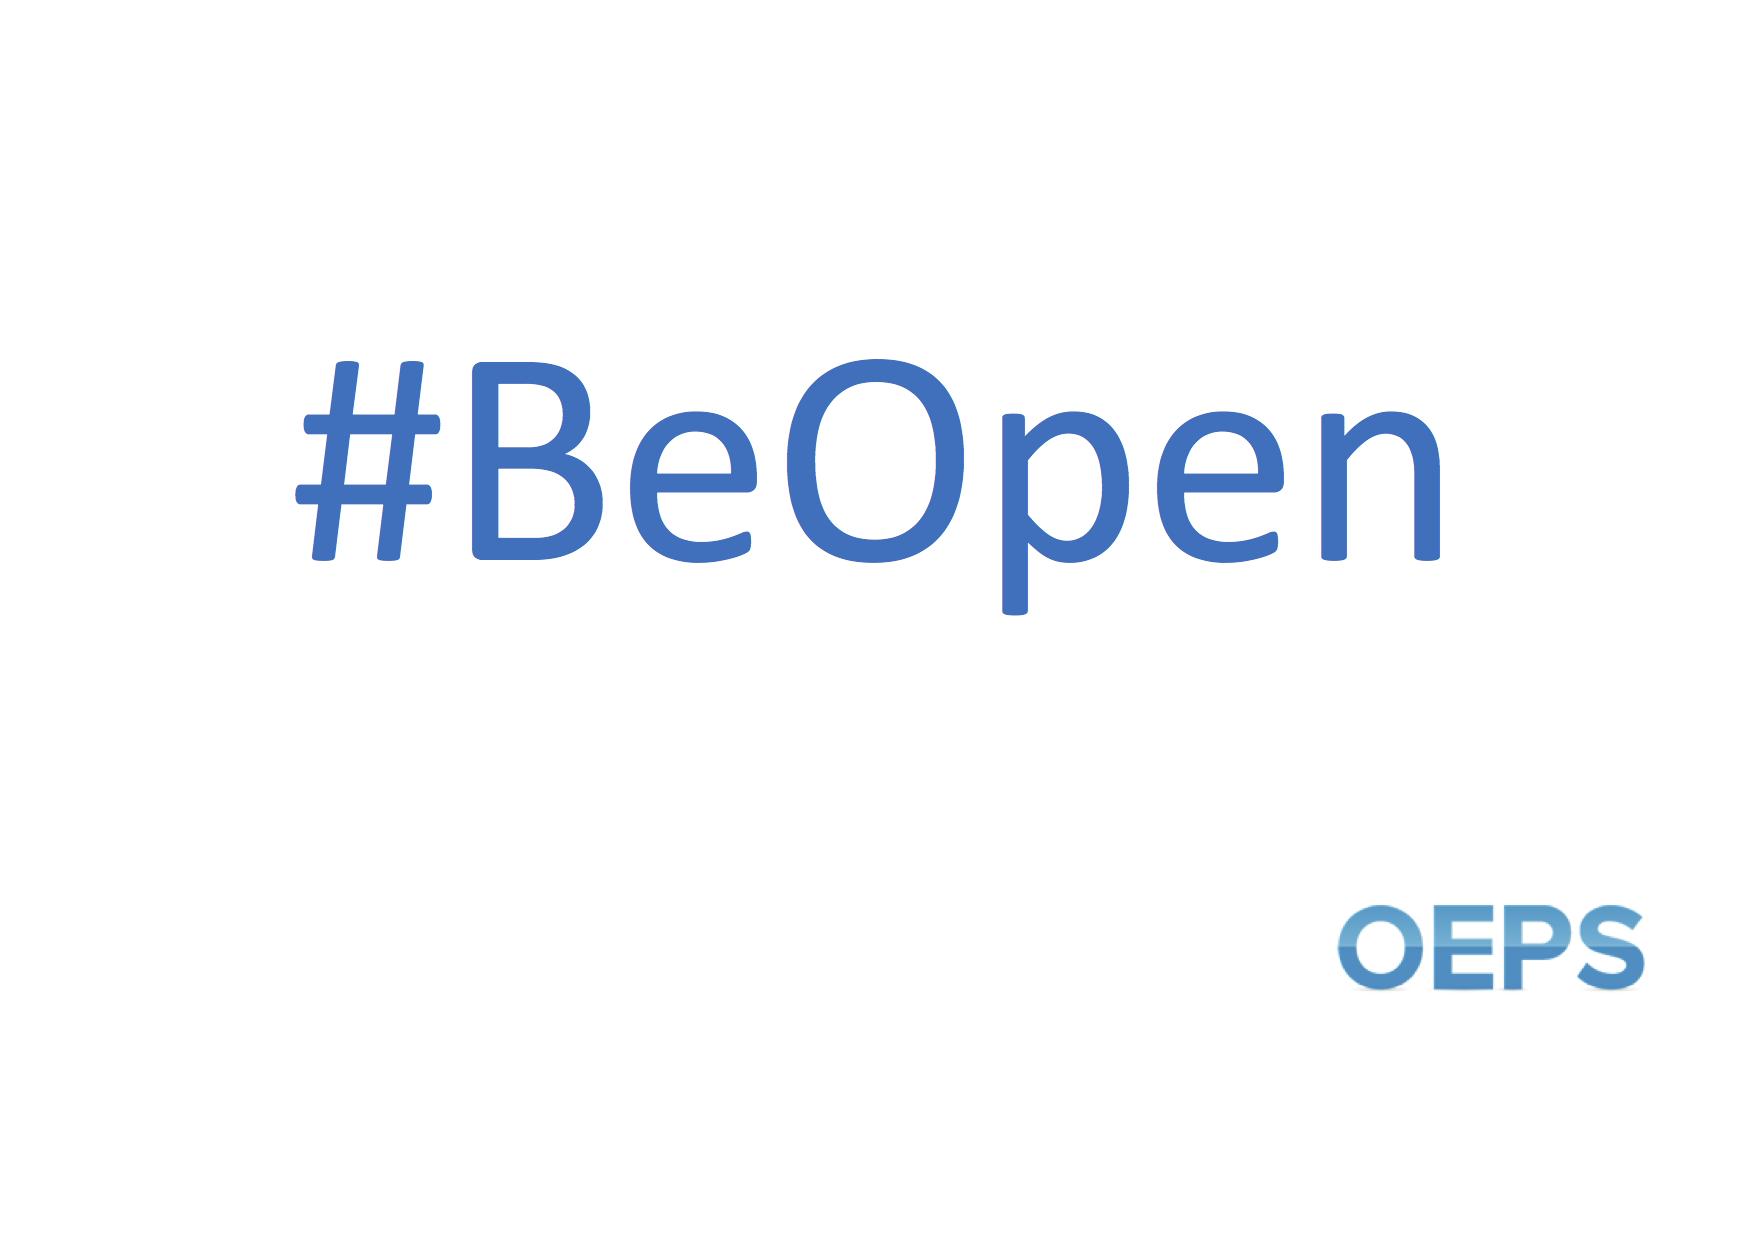 #BeOpen OEPS image